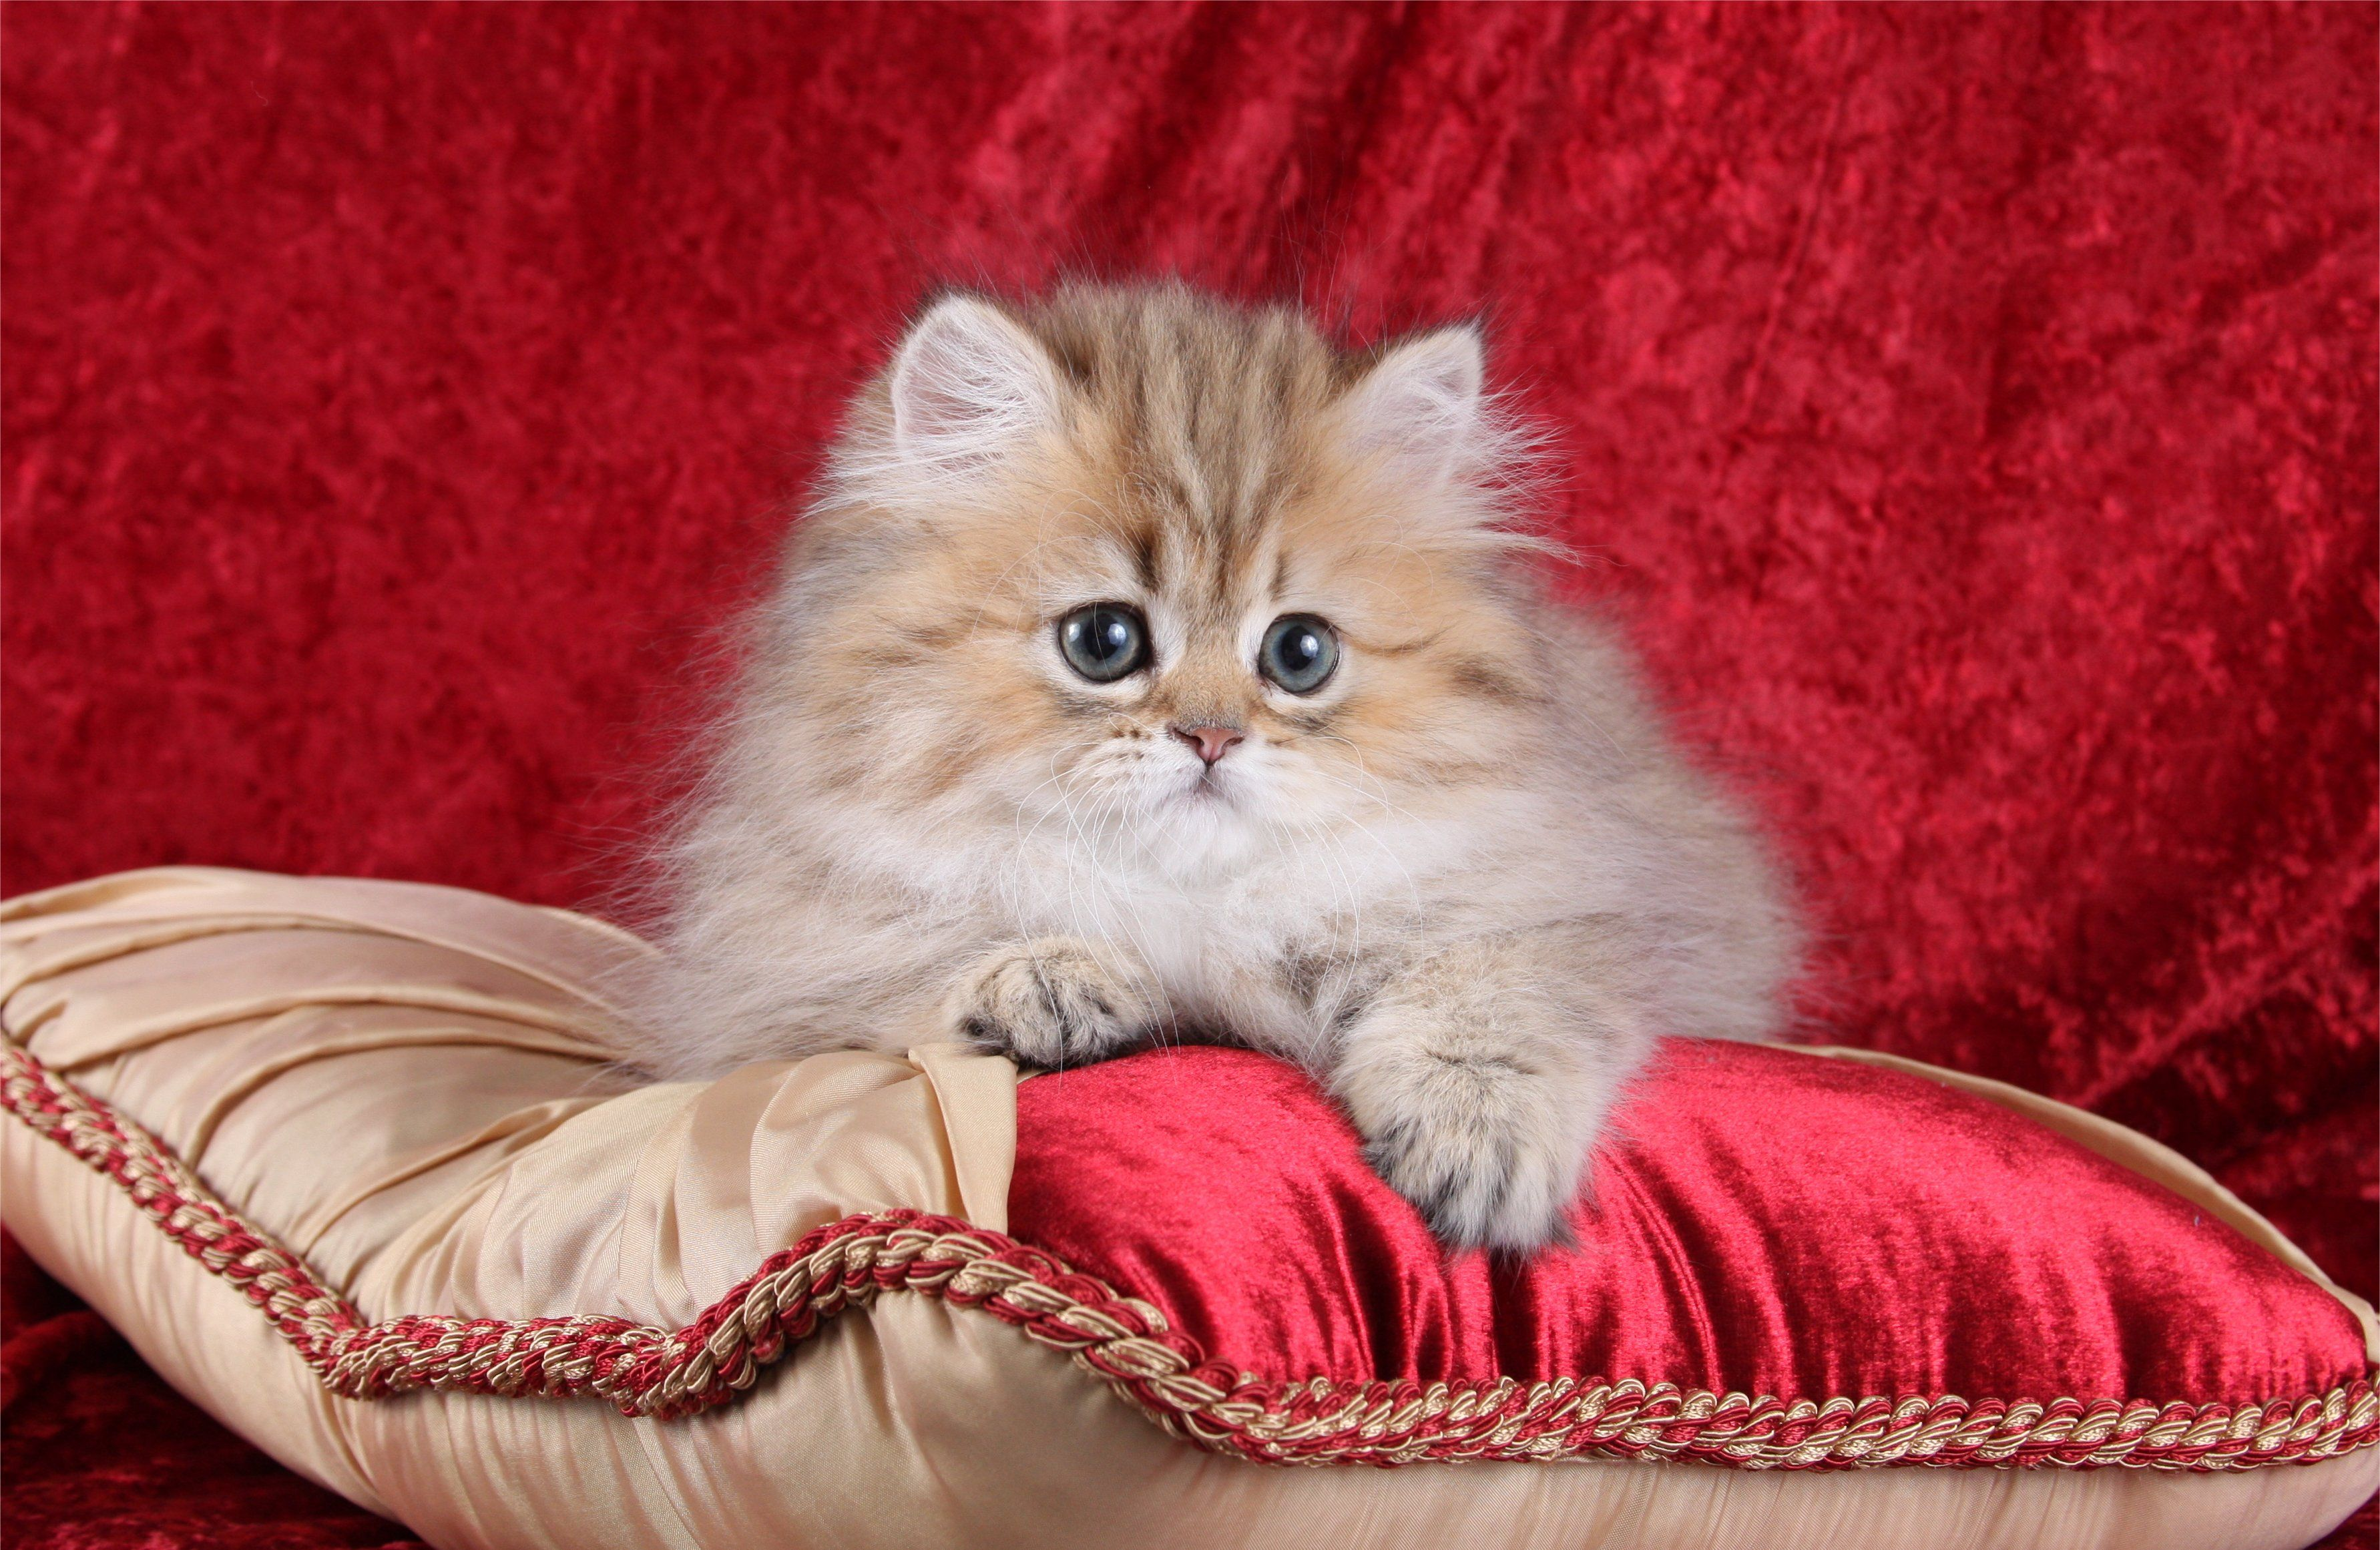 Teacup Persian Kitten Informationultra Rare Persian Kittens For Sale Teacup Persian Kittens Persian Kittens For Sale Persian Kittens